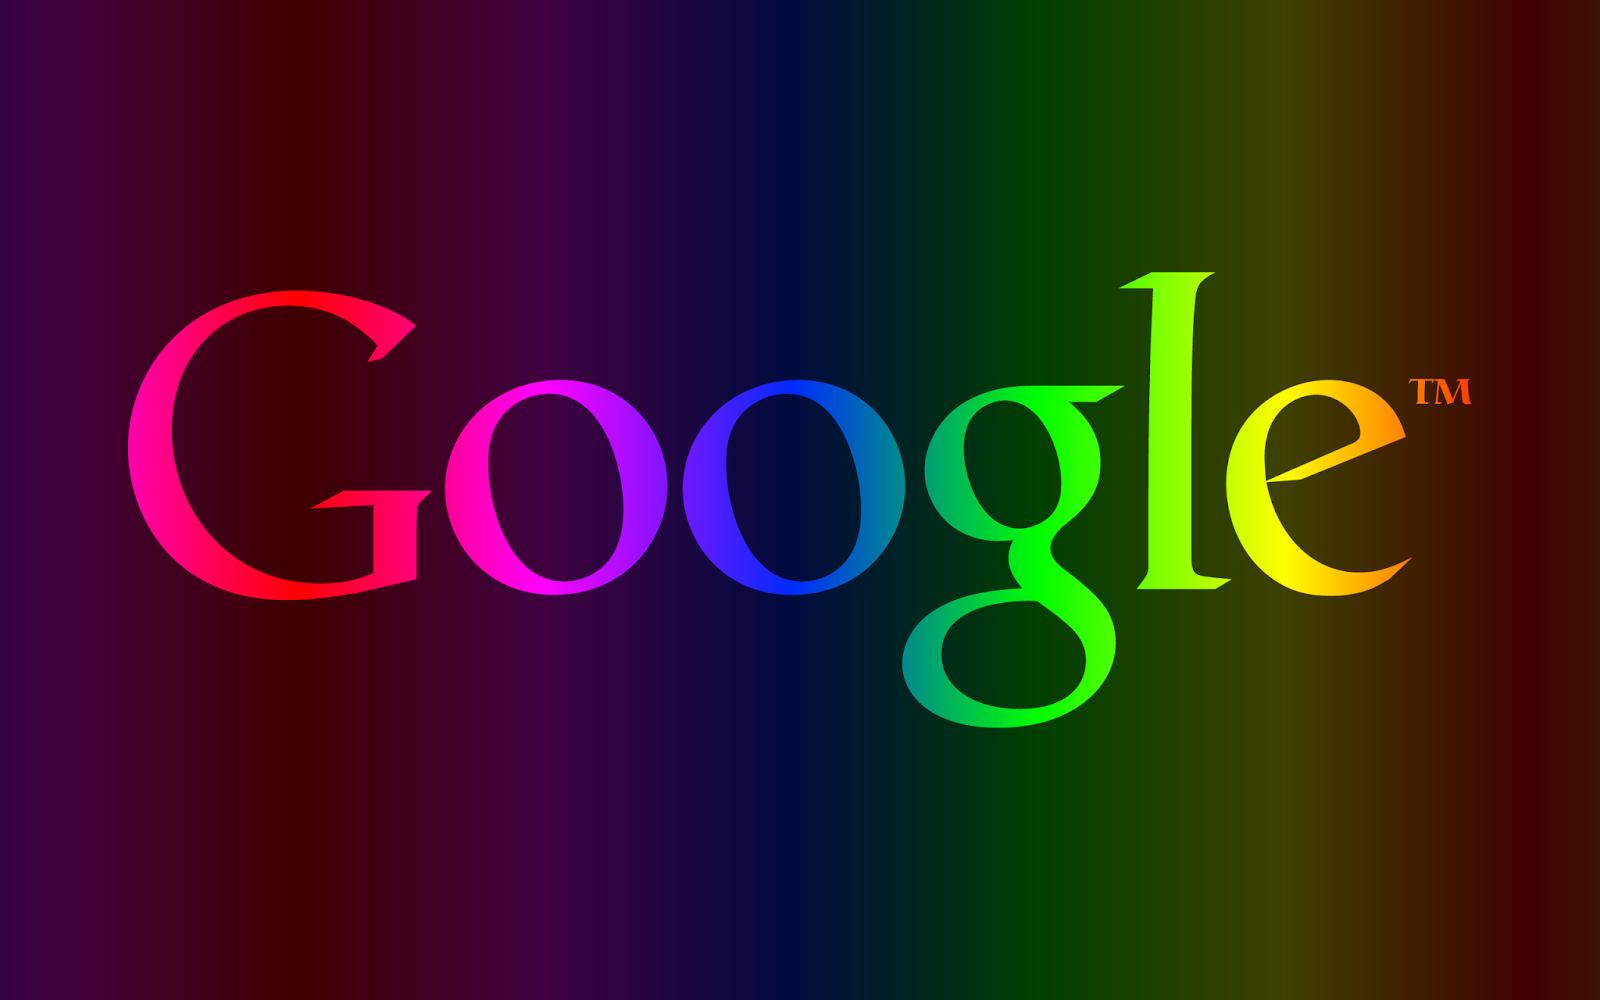 Google поймали на слежке за пользователями Apple и требуют $4,3 миллиарда компенсации